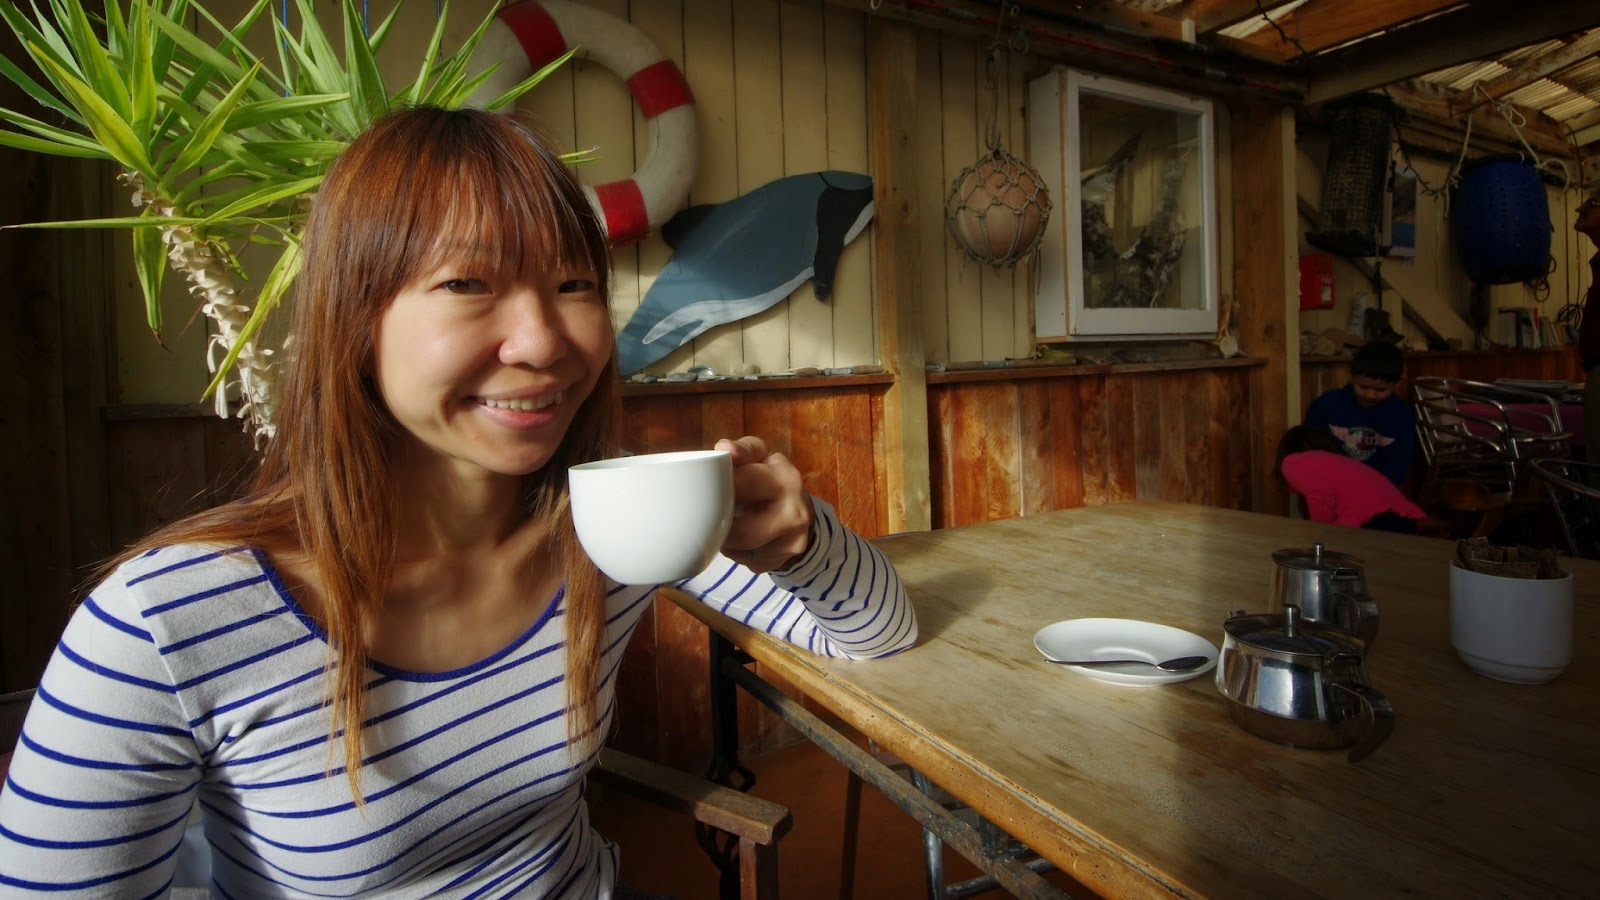 Gratuitous tourist having a coffee